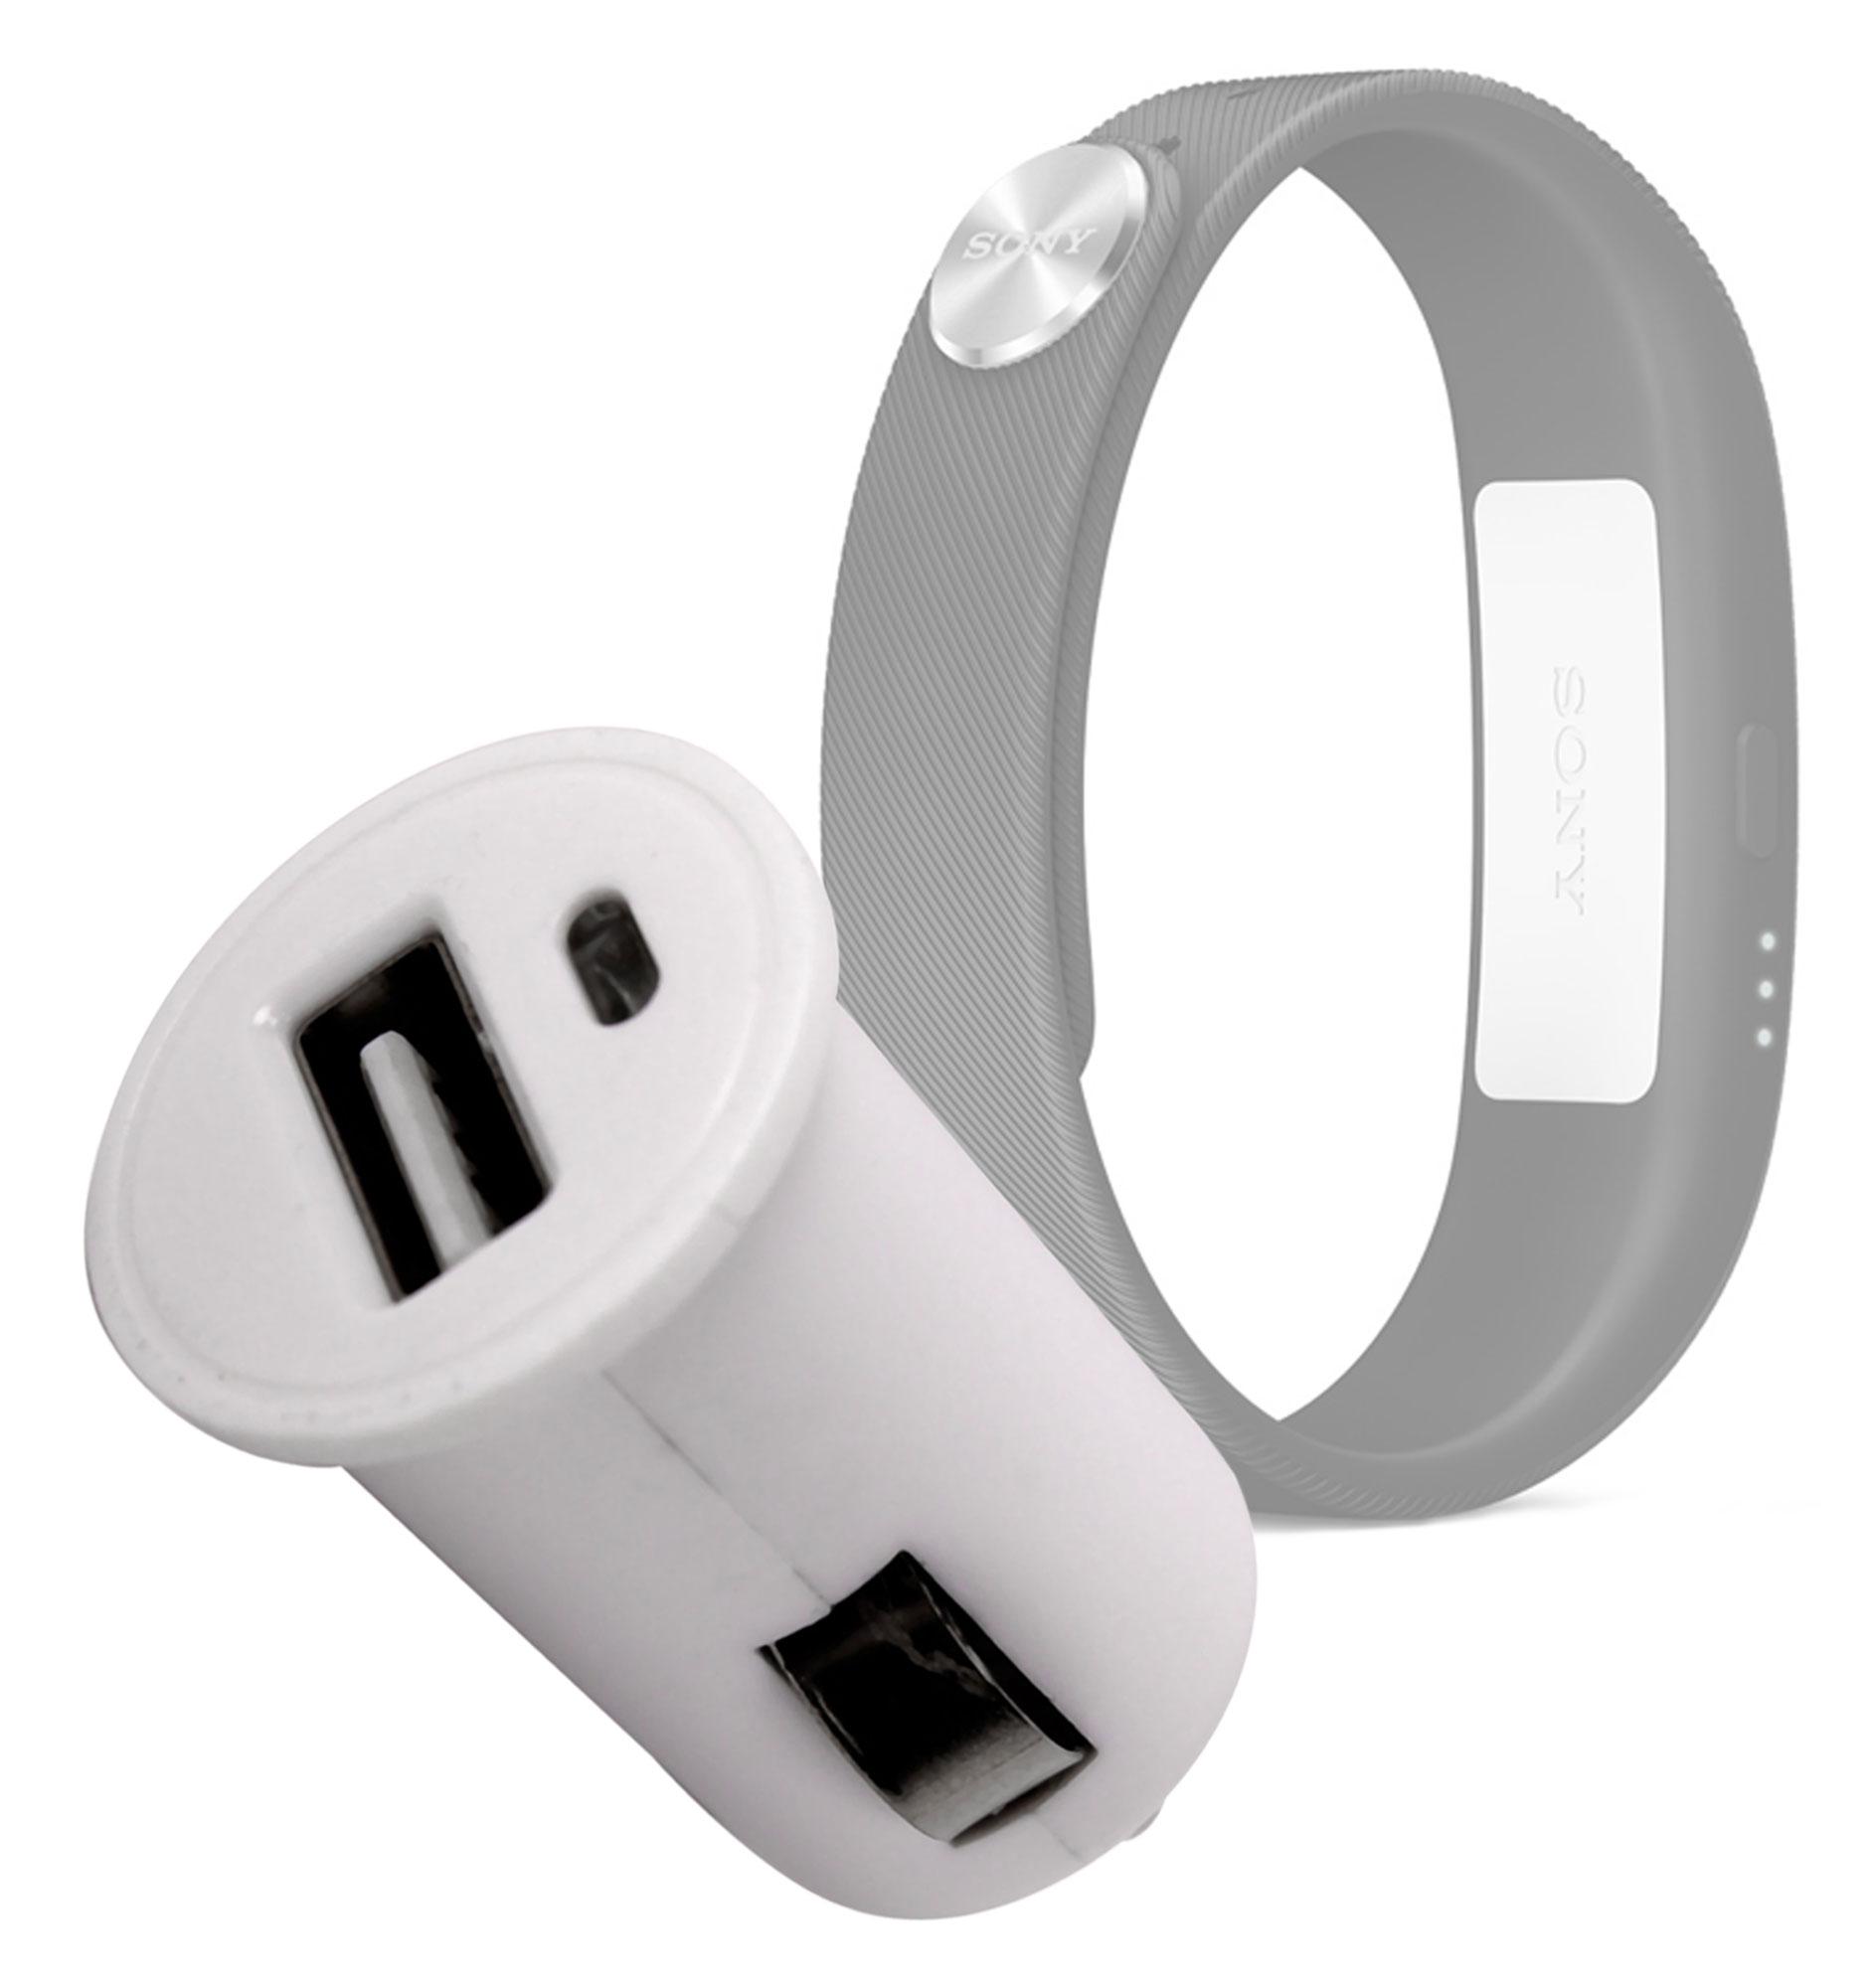 chargeur voiture 1 amp prise usb pour montre sony smartband swr10 smartwatch ebay. Black Bedroom Furniture Sets. Home Design Ideas